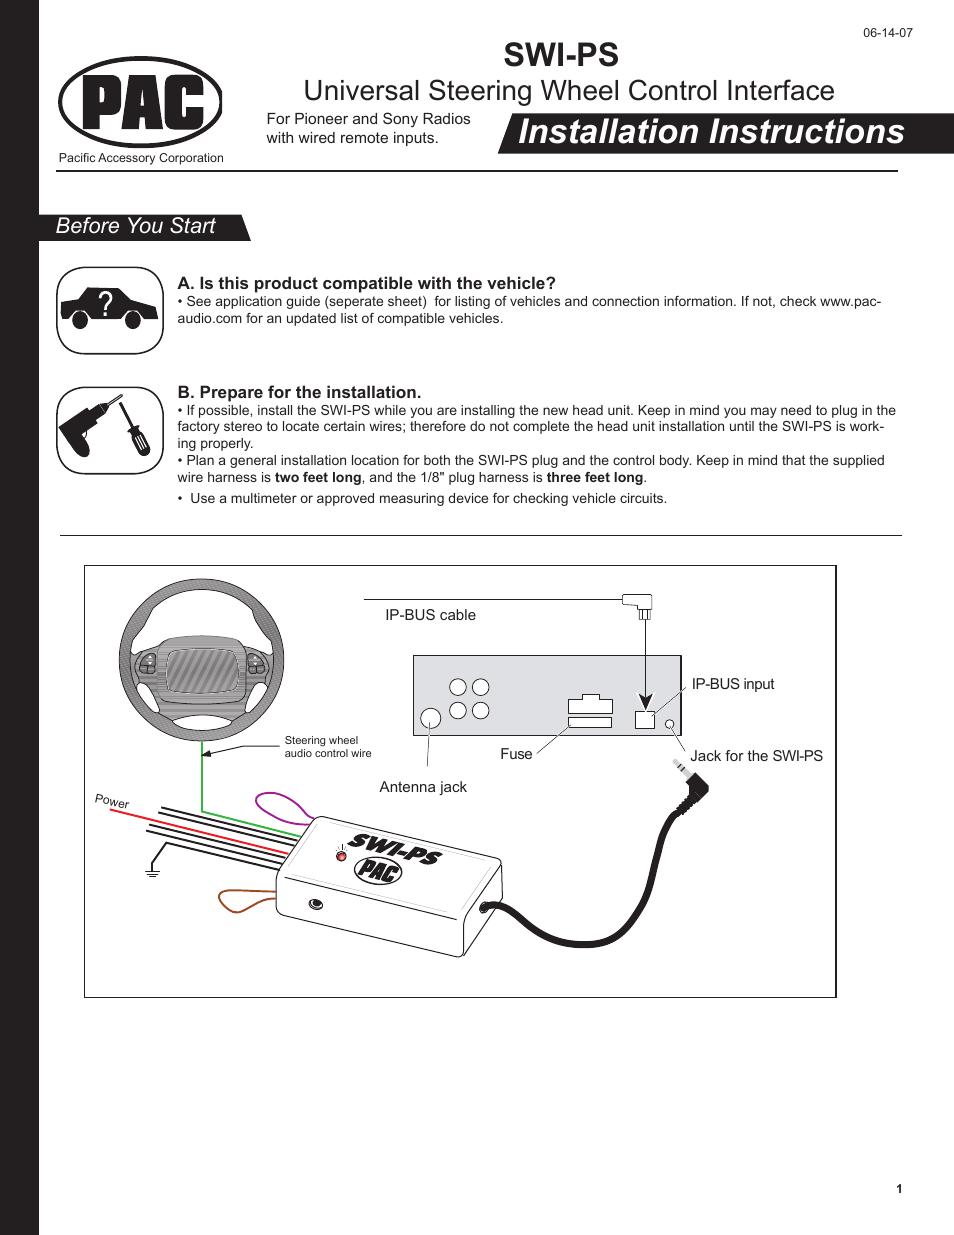 medium resolution of artic pac wiring diagram wiring diagram dat artic pac wiring diagram